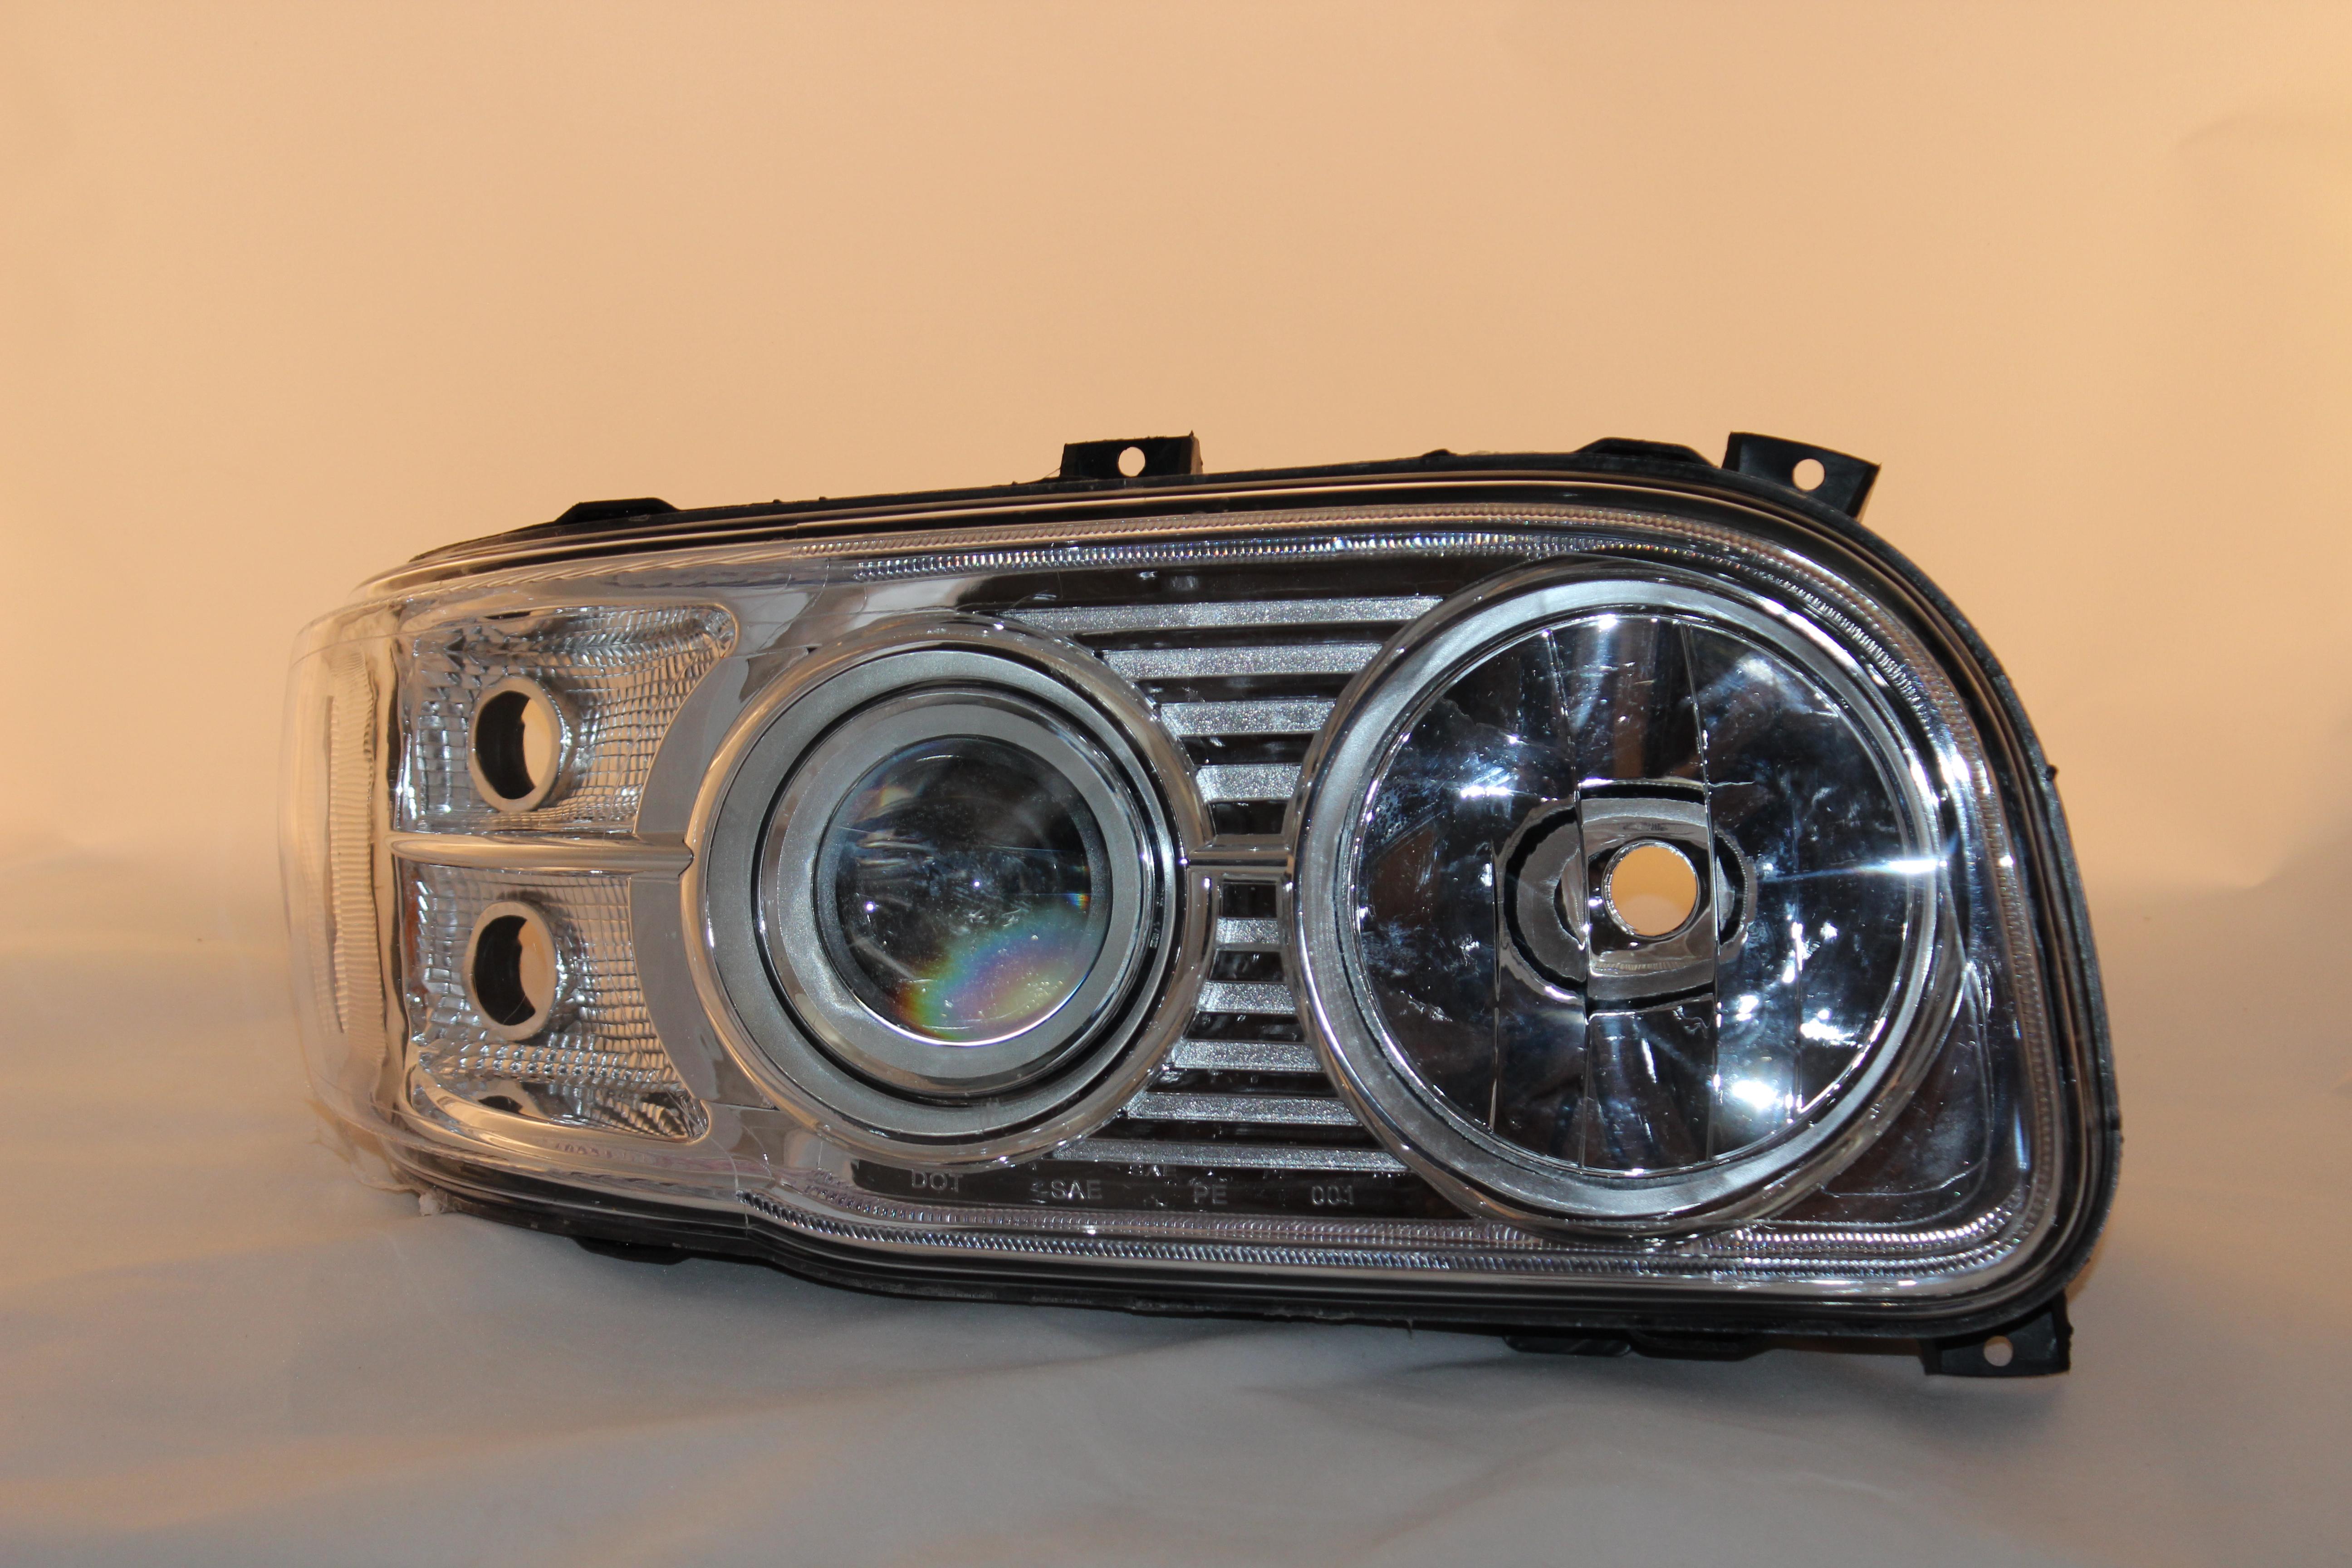 peterbilt 388 389 567 bi xenon projector headlight upgrade. Black Bedroom Furniture Sets. Home Design Ideas